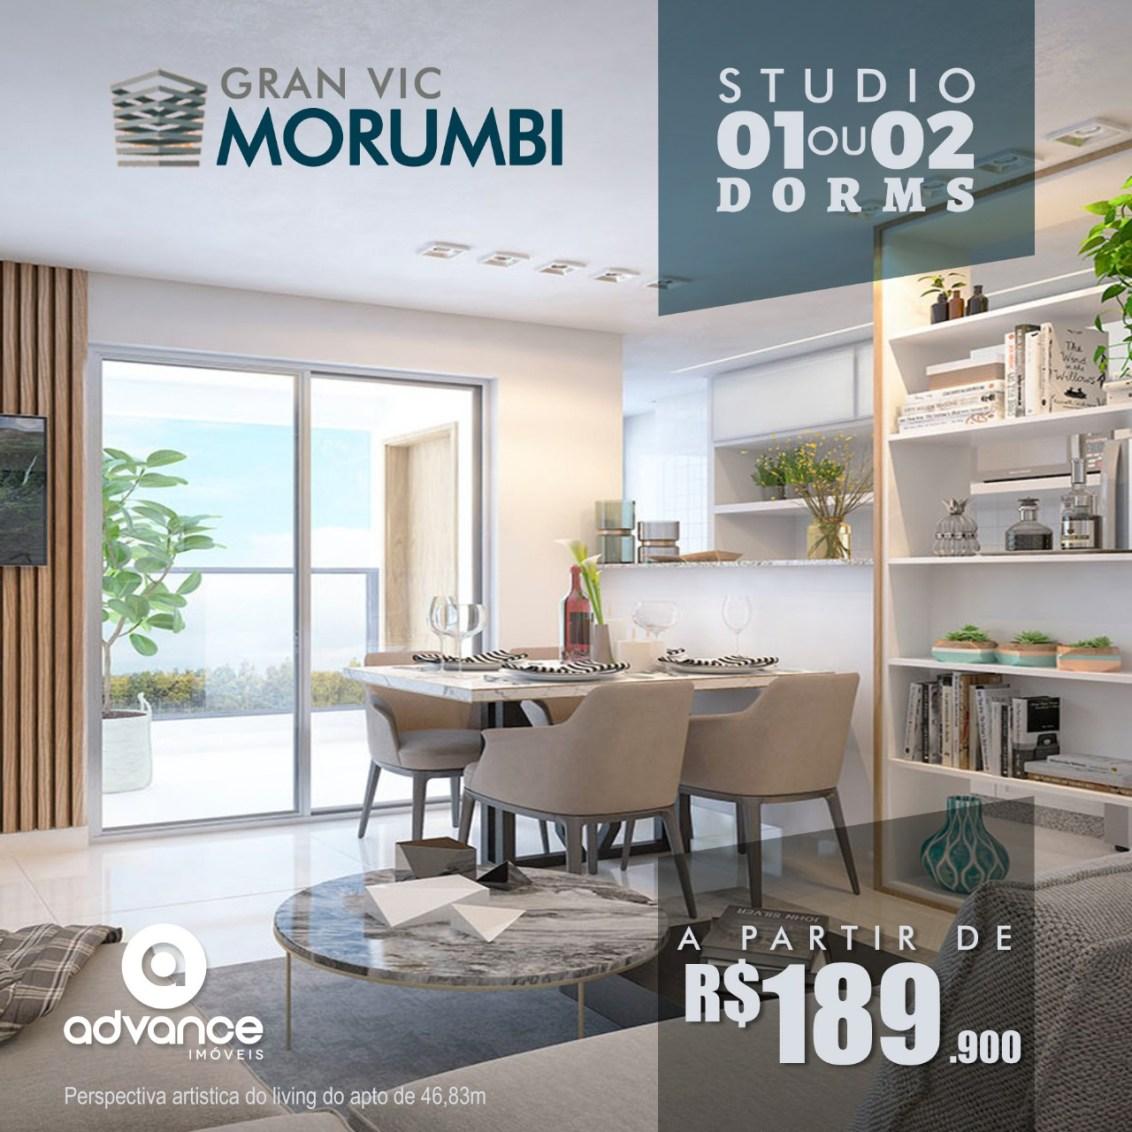 Apartamento gran vic morumbi